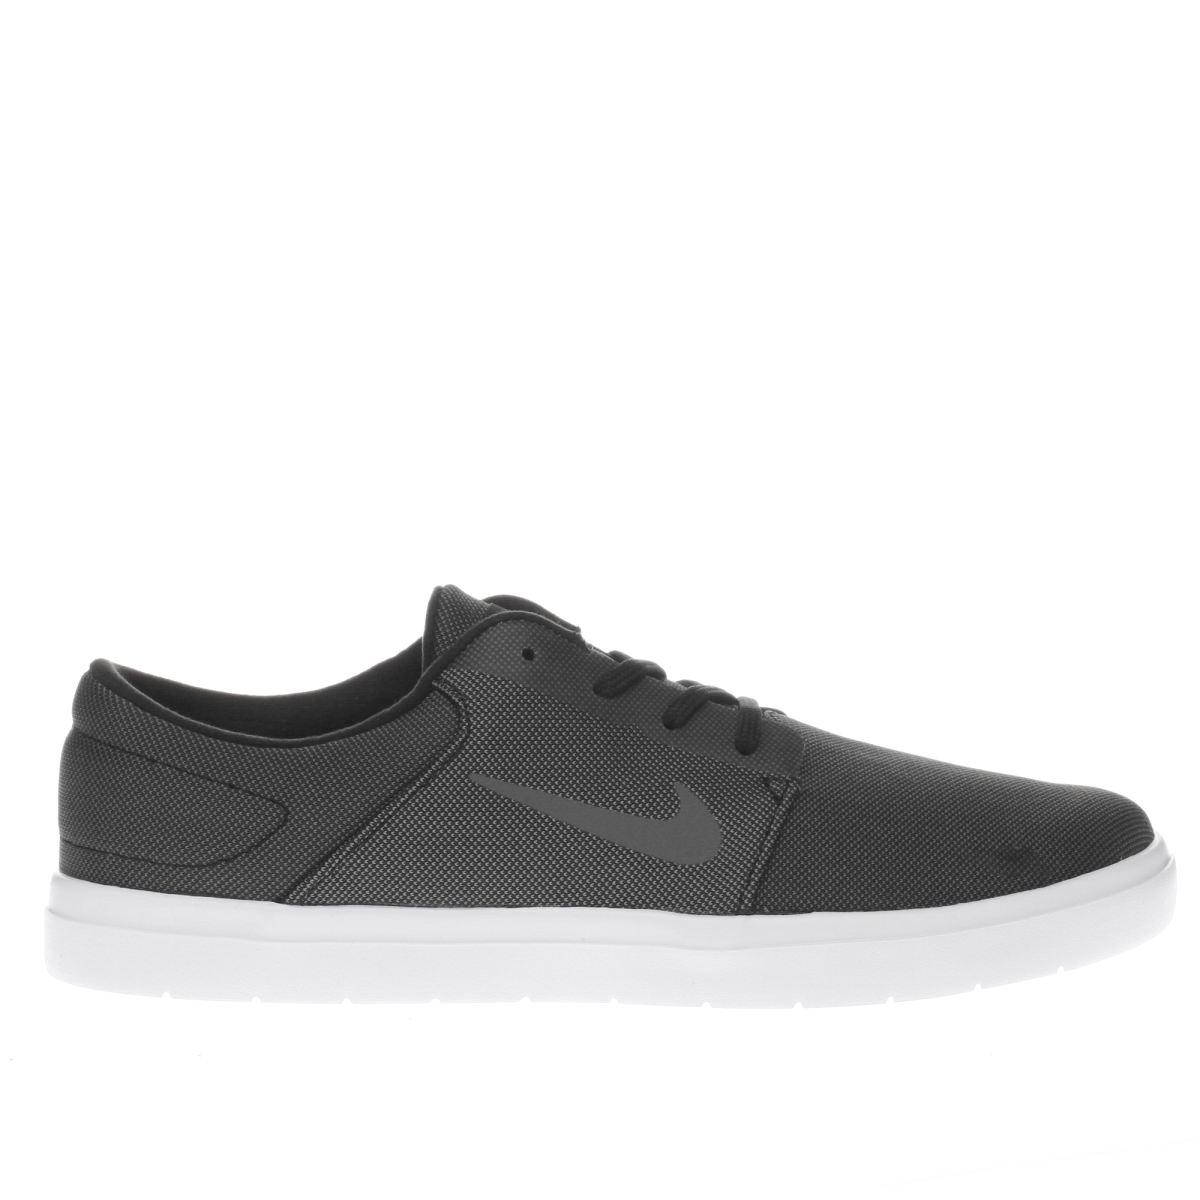 nike sb grey & black portmore ultralight trainers